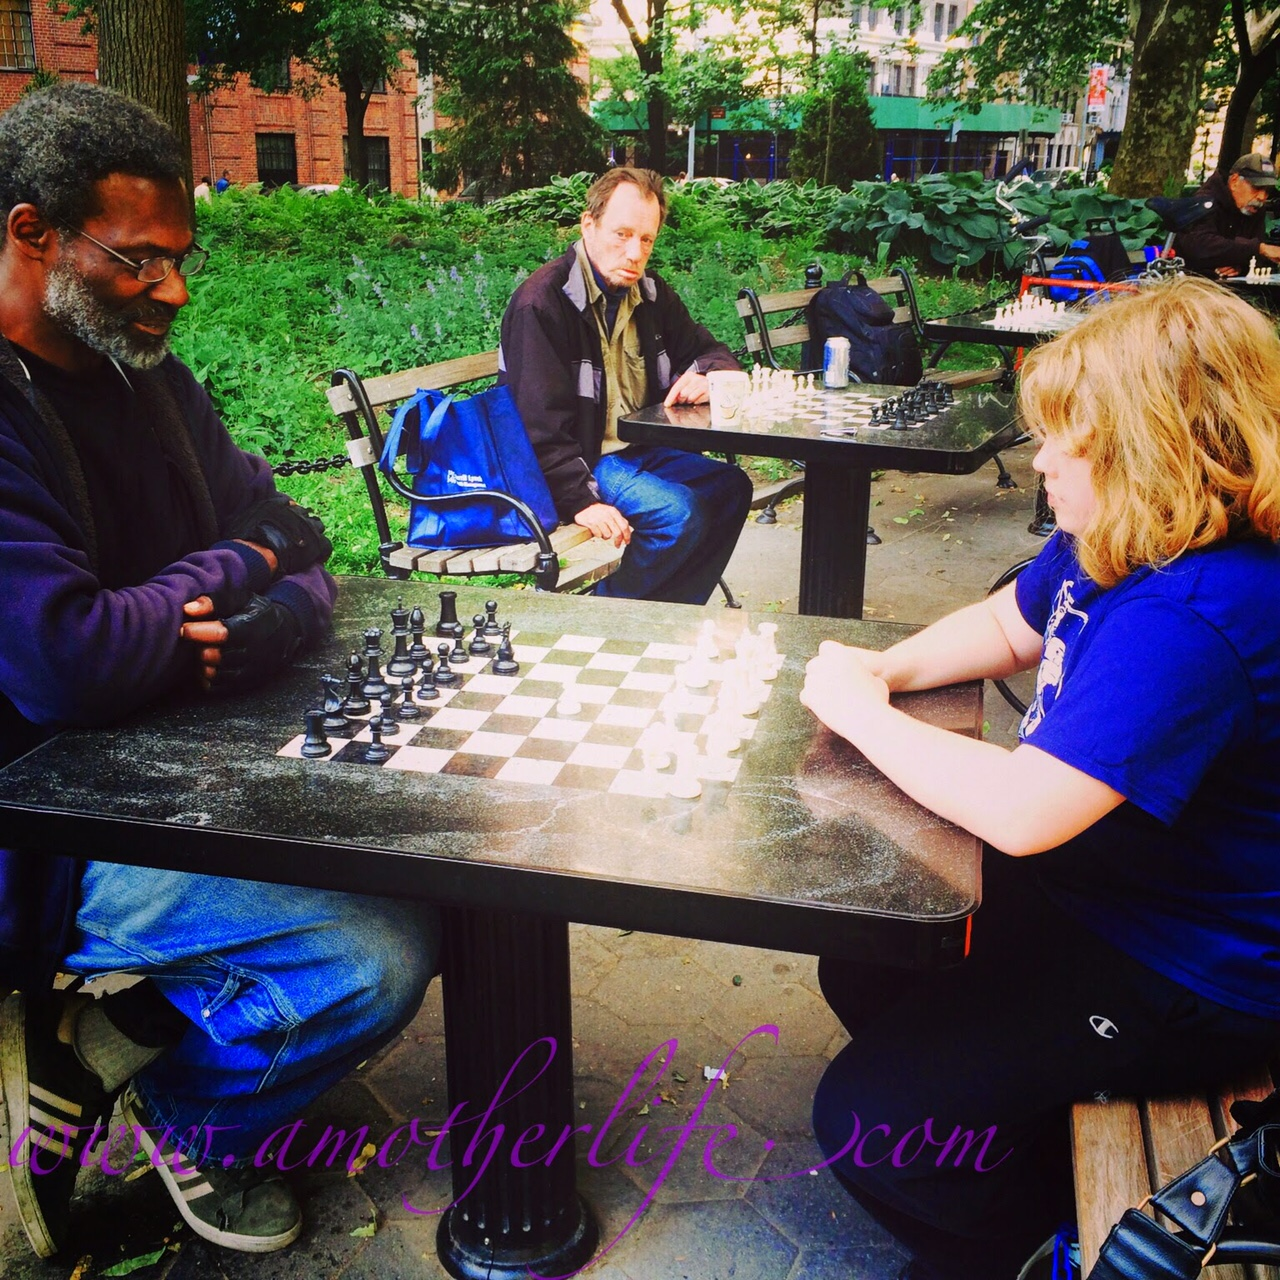 Chess Time, Next Stop Nashville